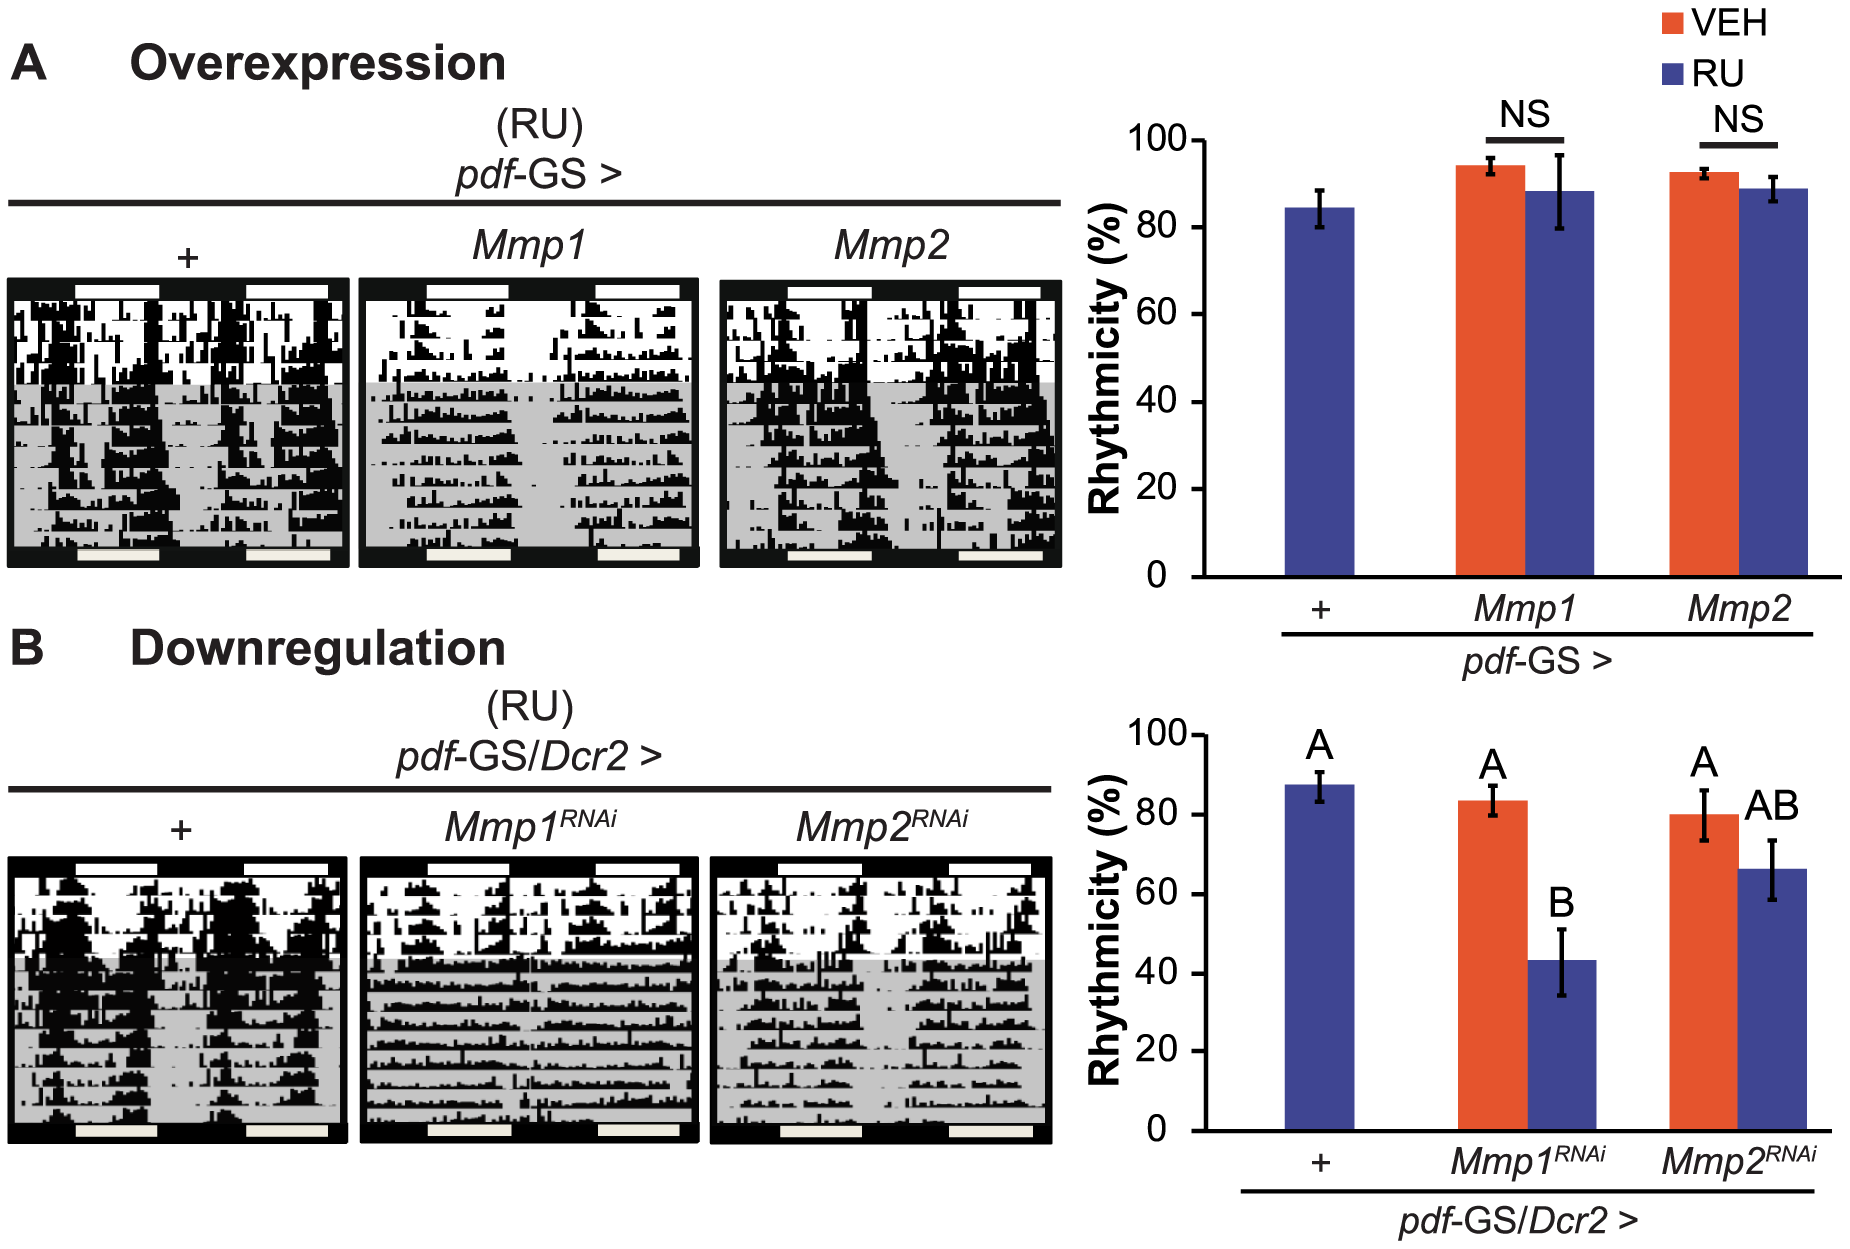 Mmp1 modulates behavioral rhythmicity.